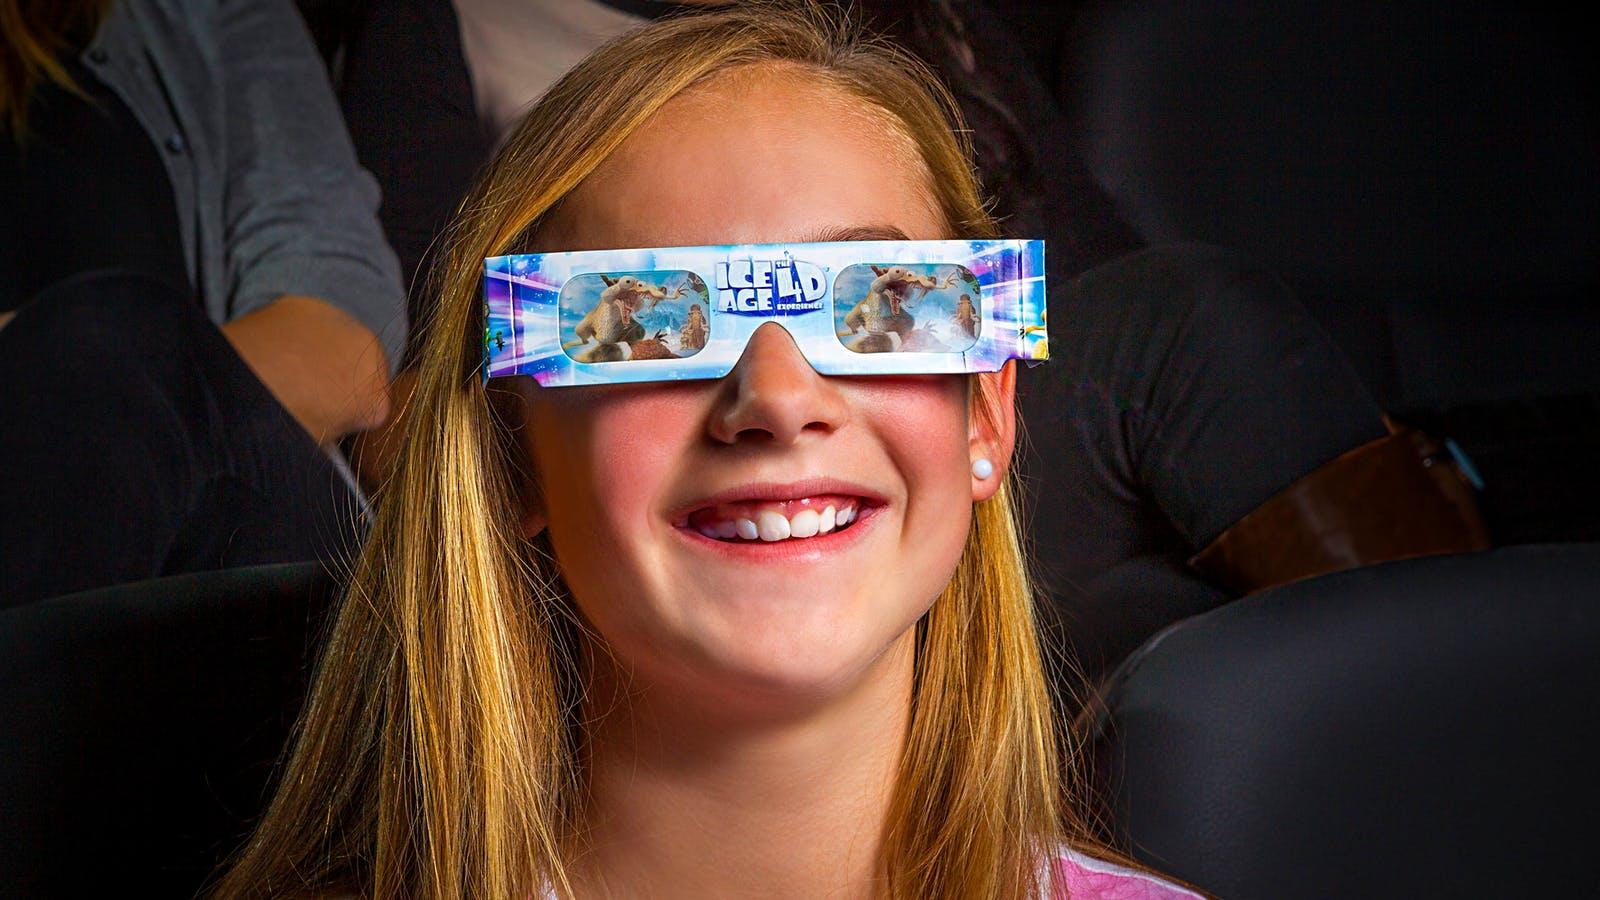 ICE AGE 4-D Cinema